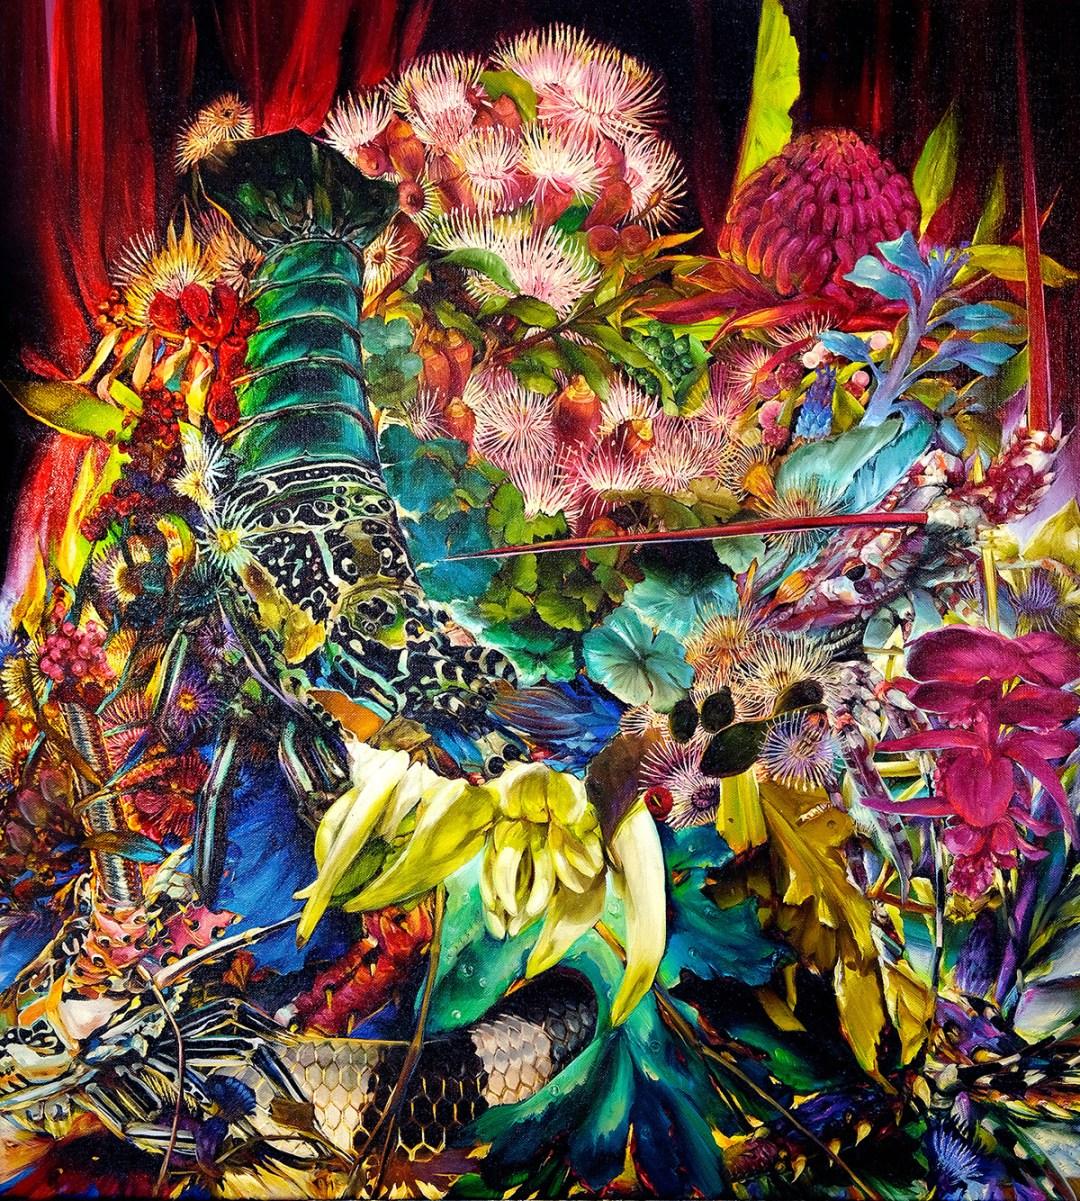 """Sugar Fever Dream"" by Artist Karla Marchesi"